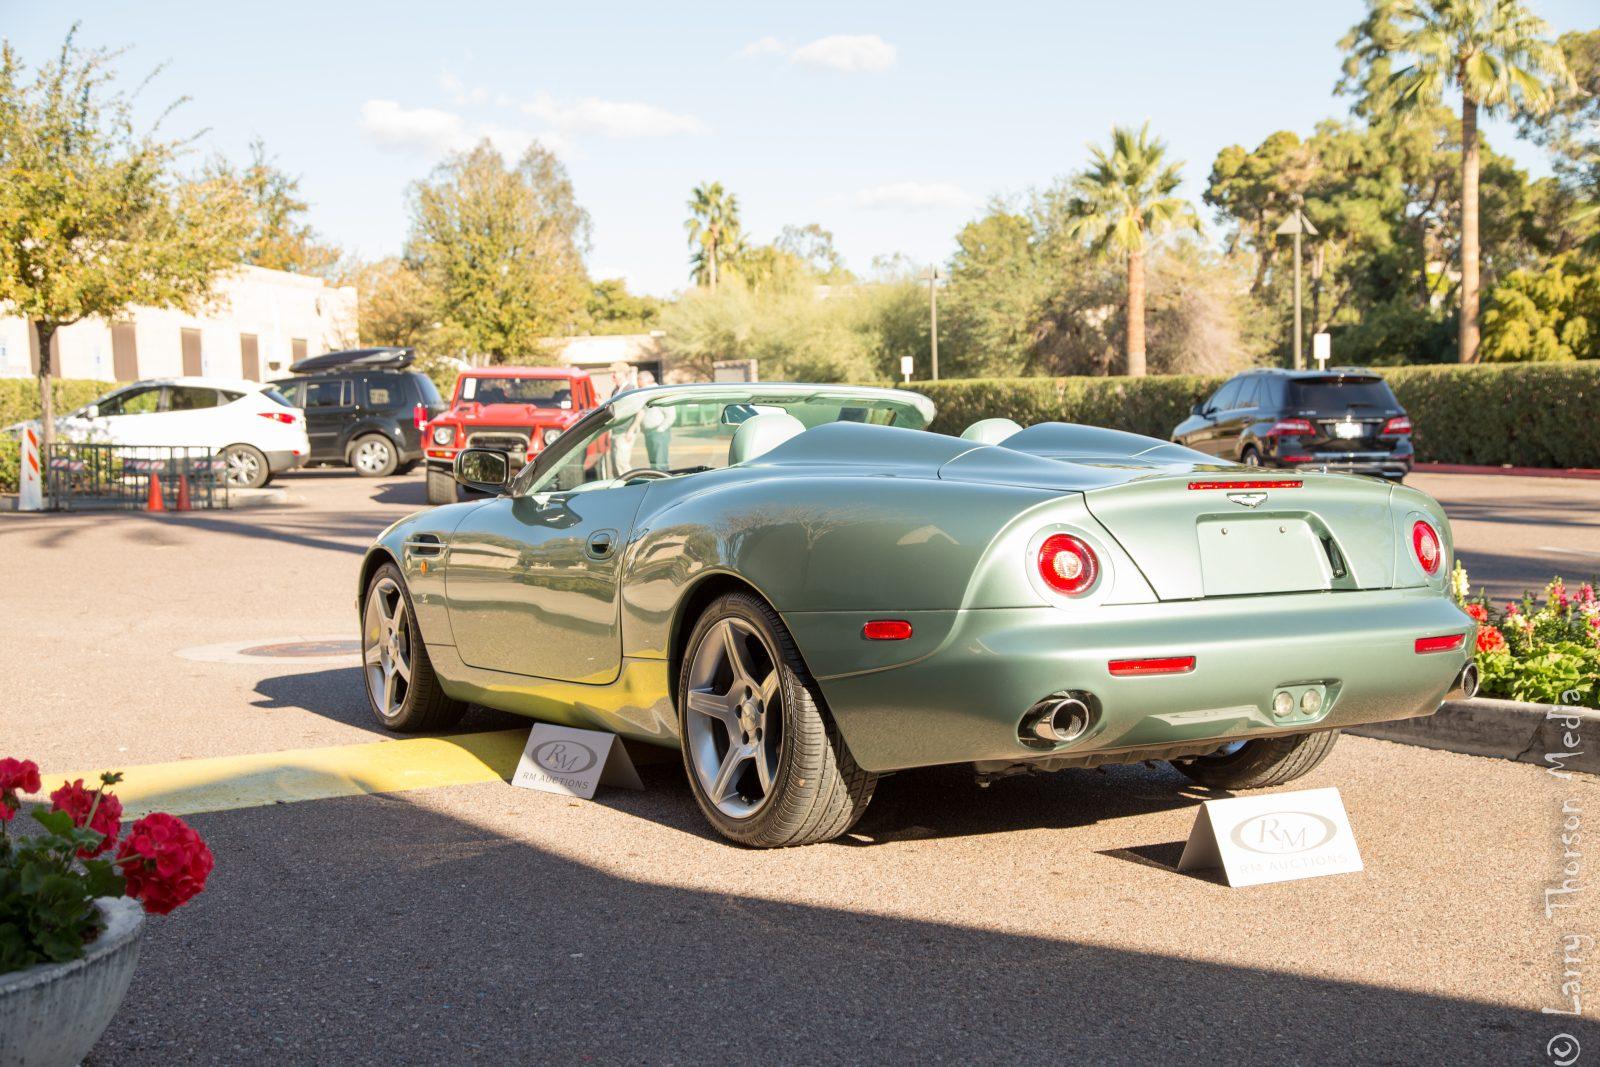 Aston-Martin-DB7-Zagato-10-e1476501085143.jpg